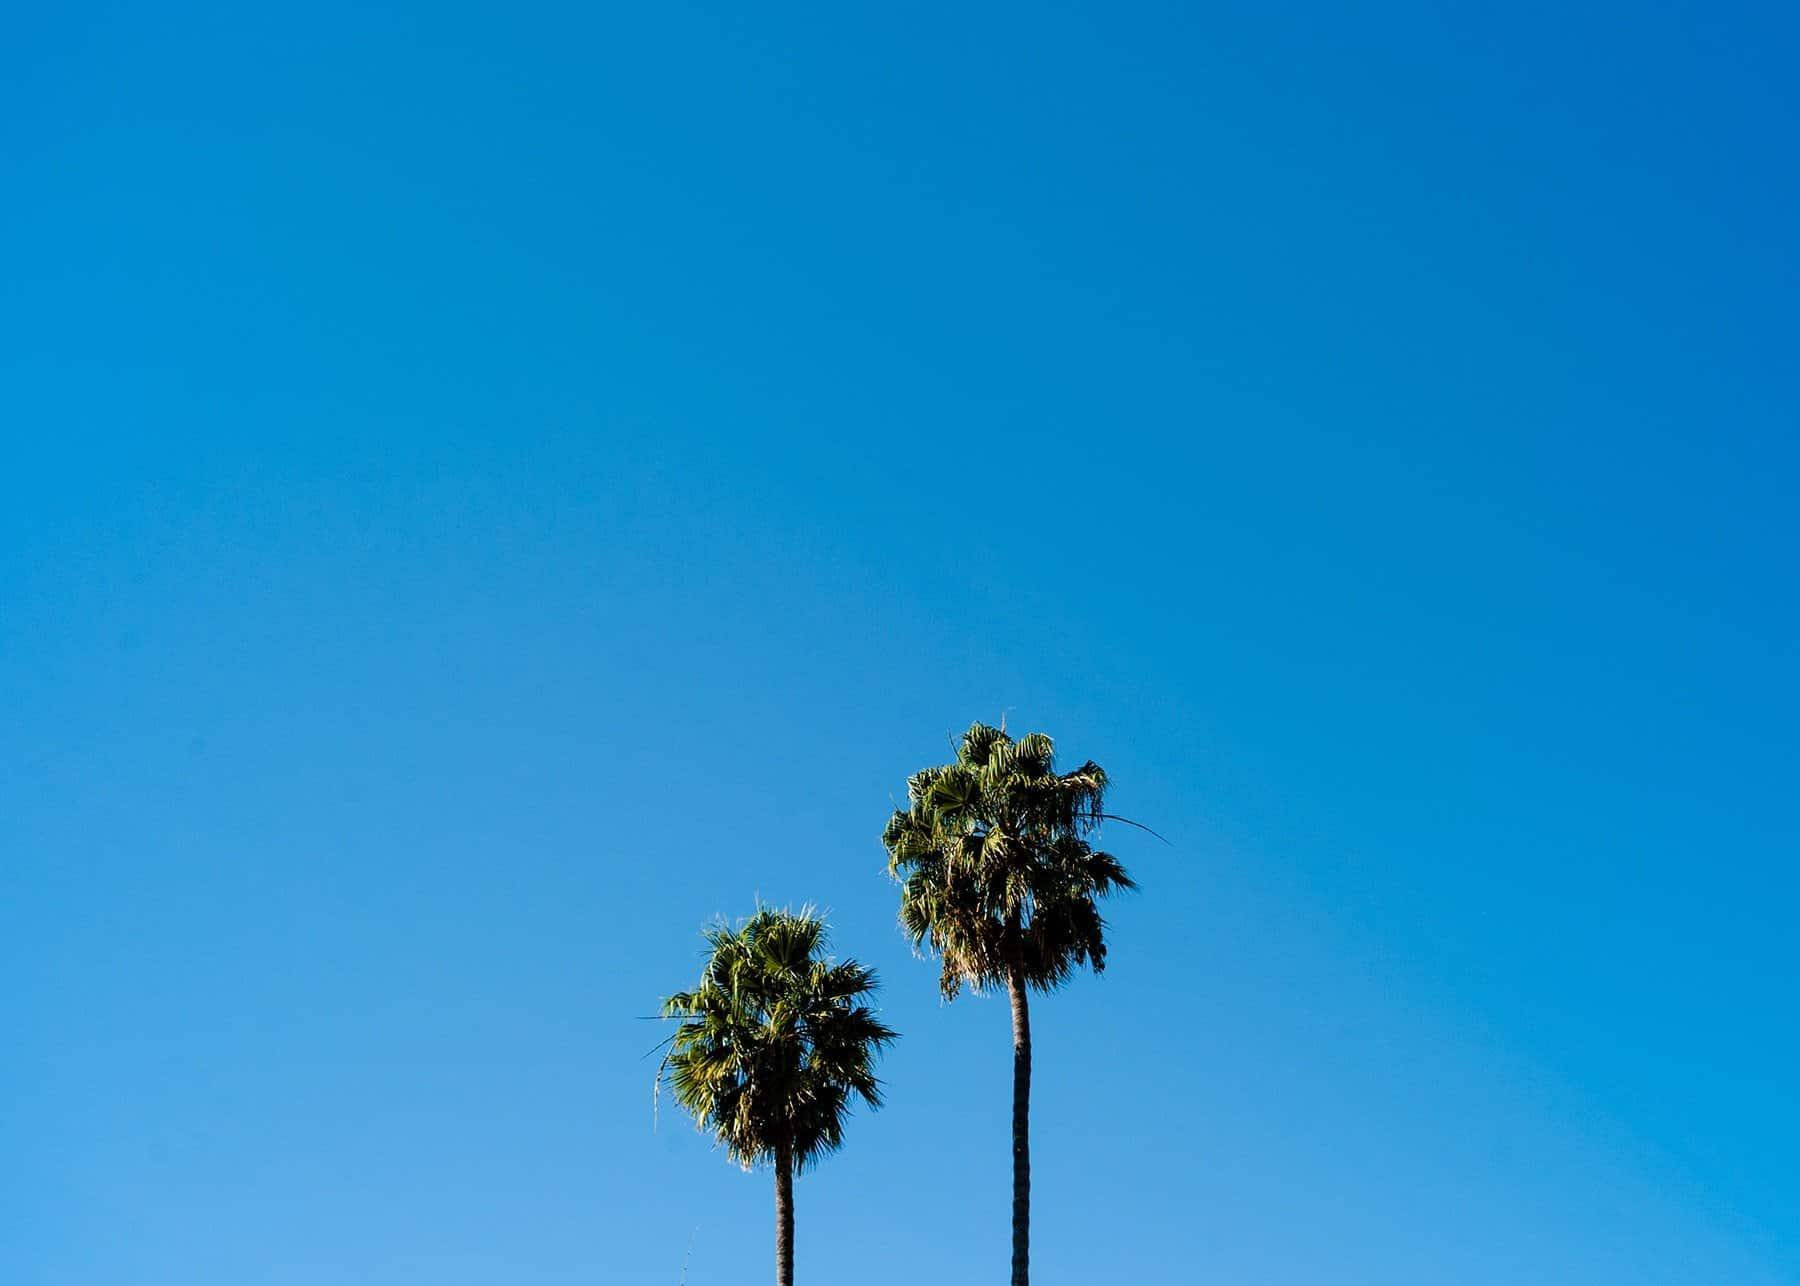 binary-palm-trees-e1539585336233